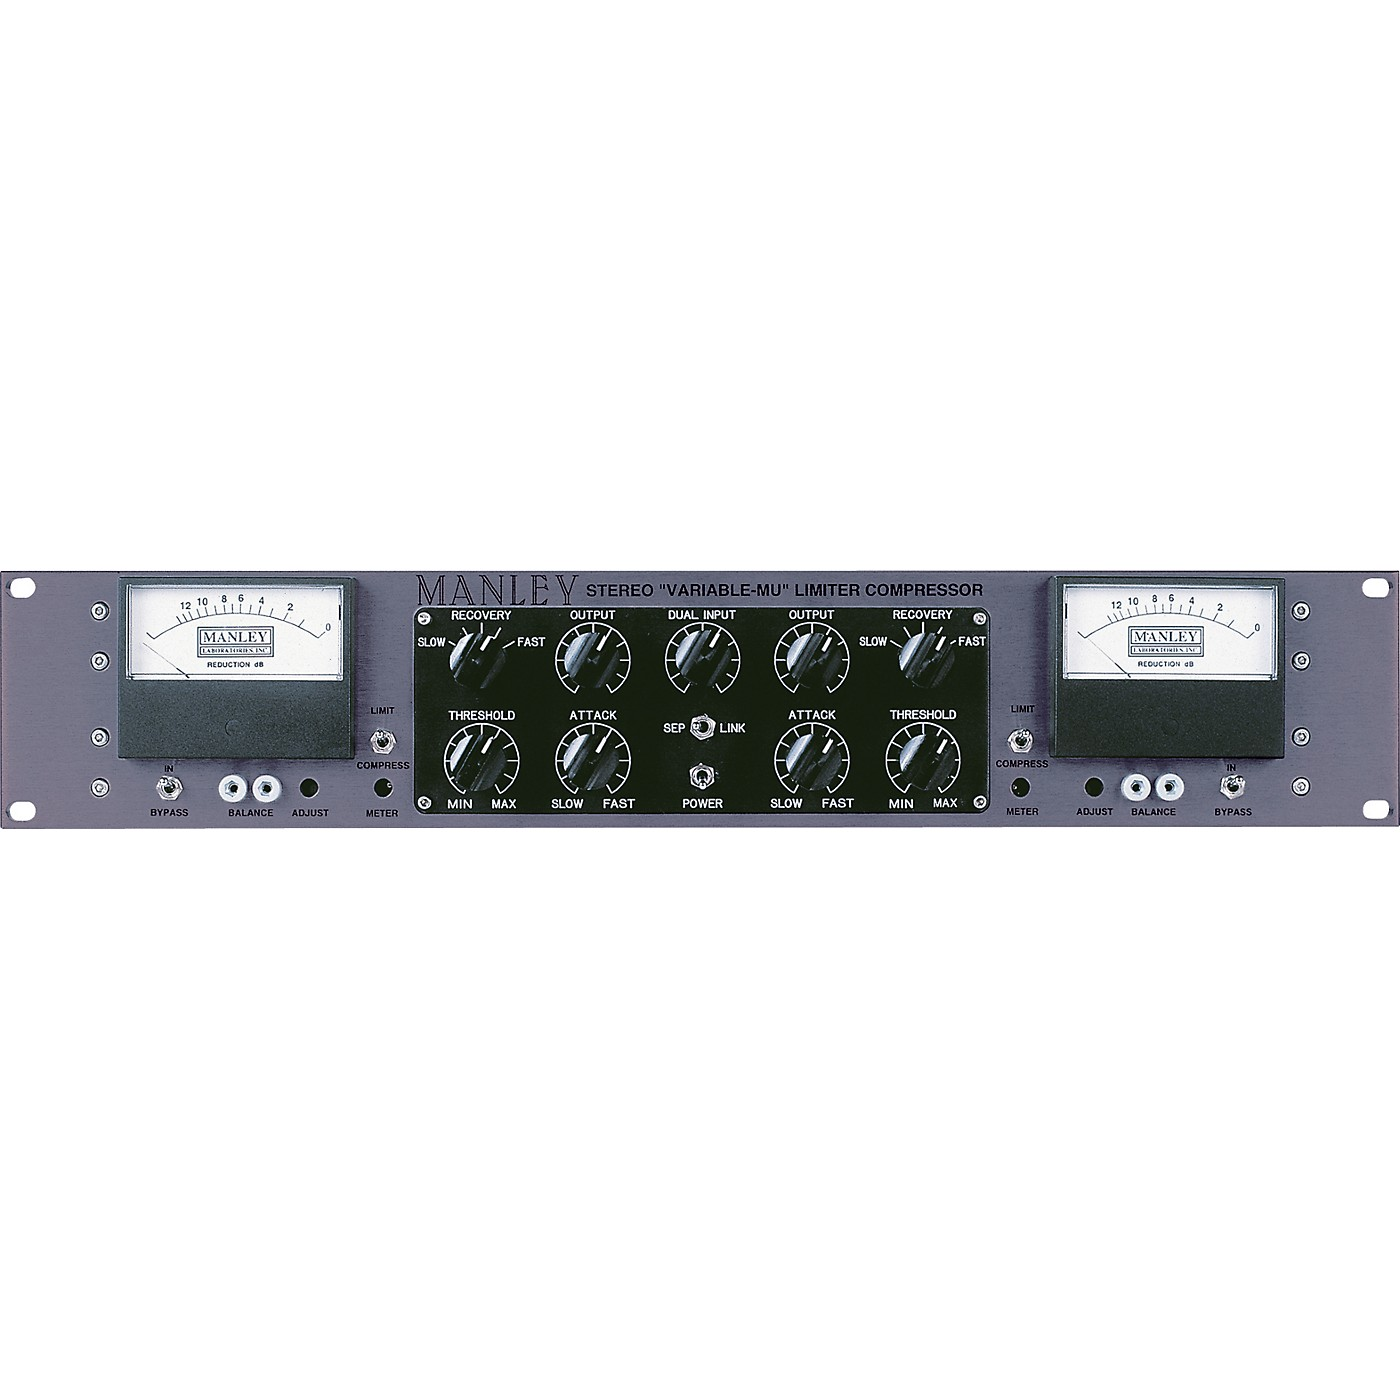 Manley Mastering Stereo Variable Mu Limiter Compressor thumbnail